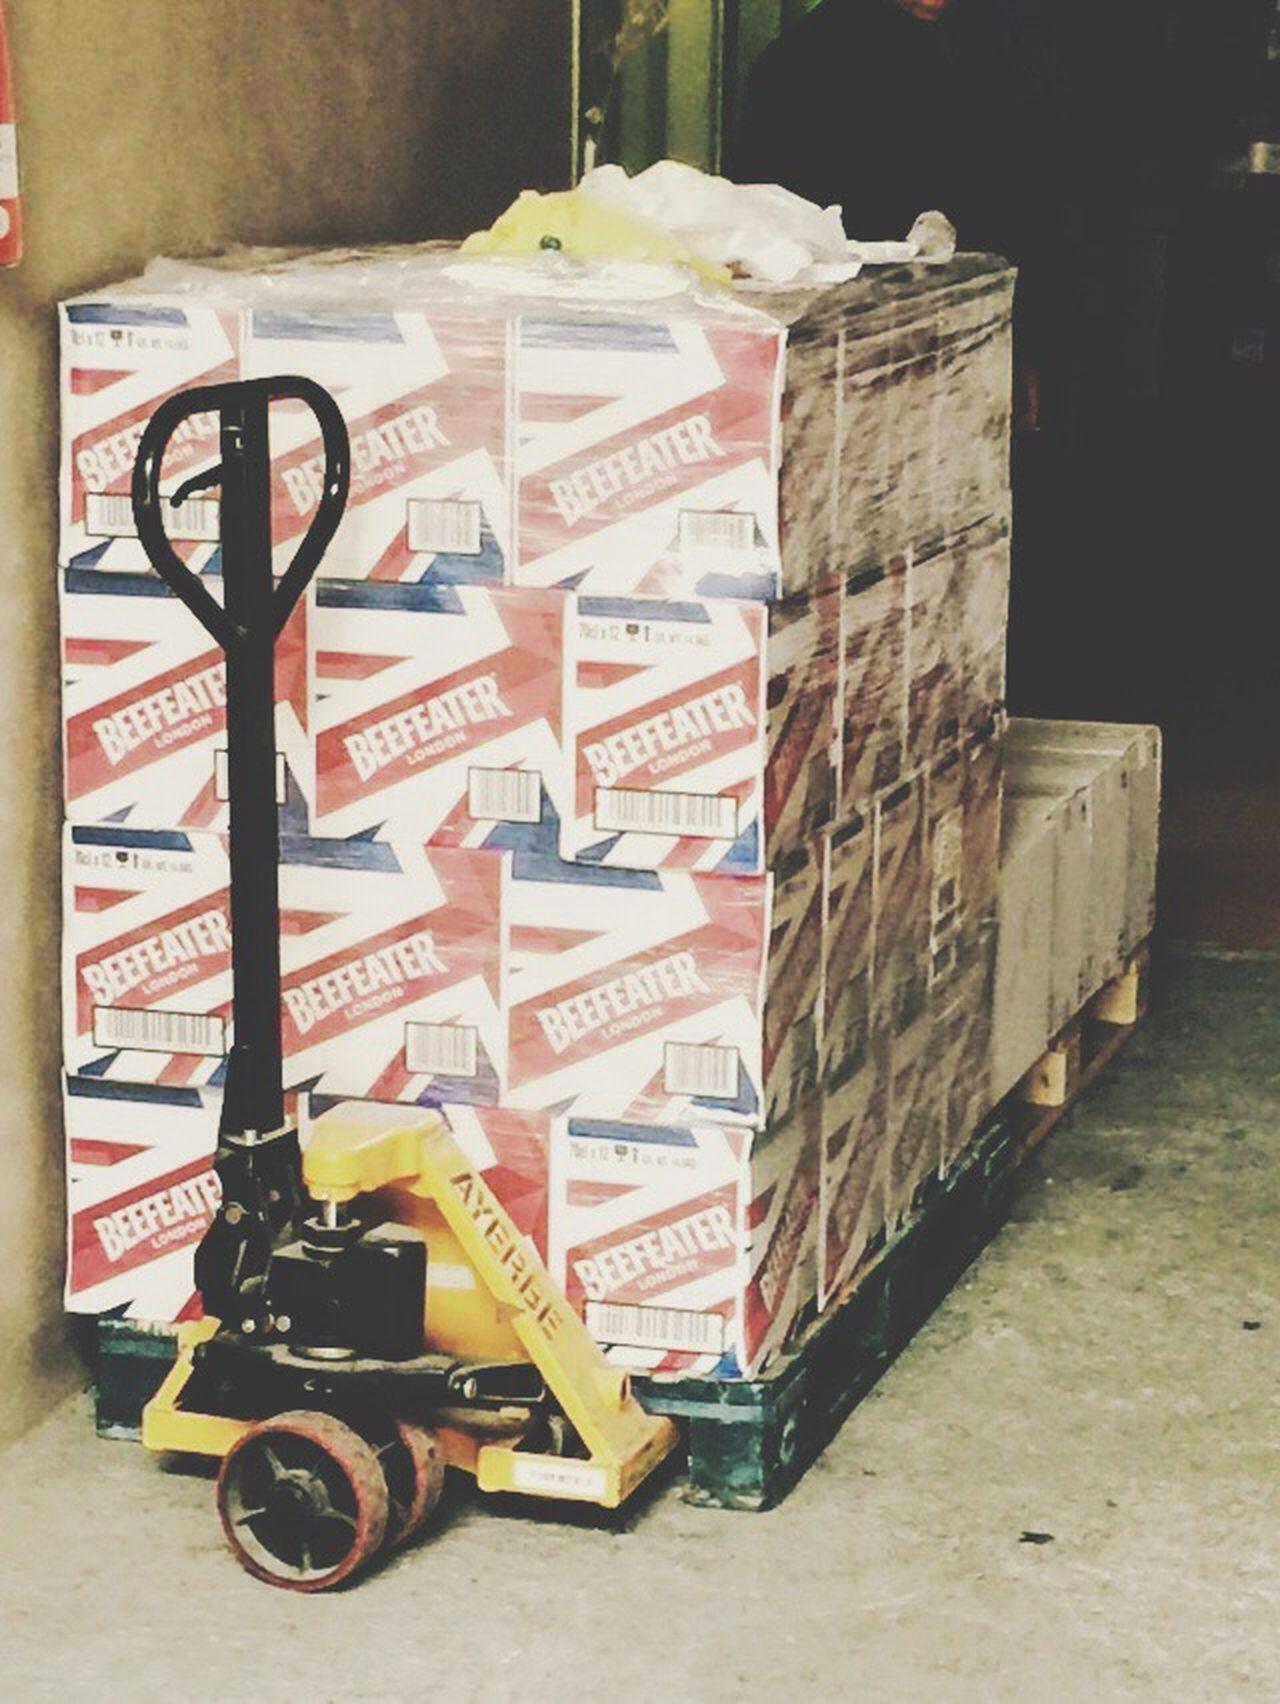 Precision Boxes Drinks Taking Photos Wheelbarrow Hard Worker Need Precision